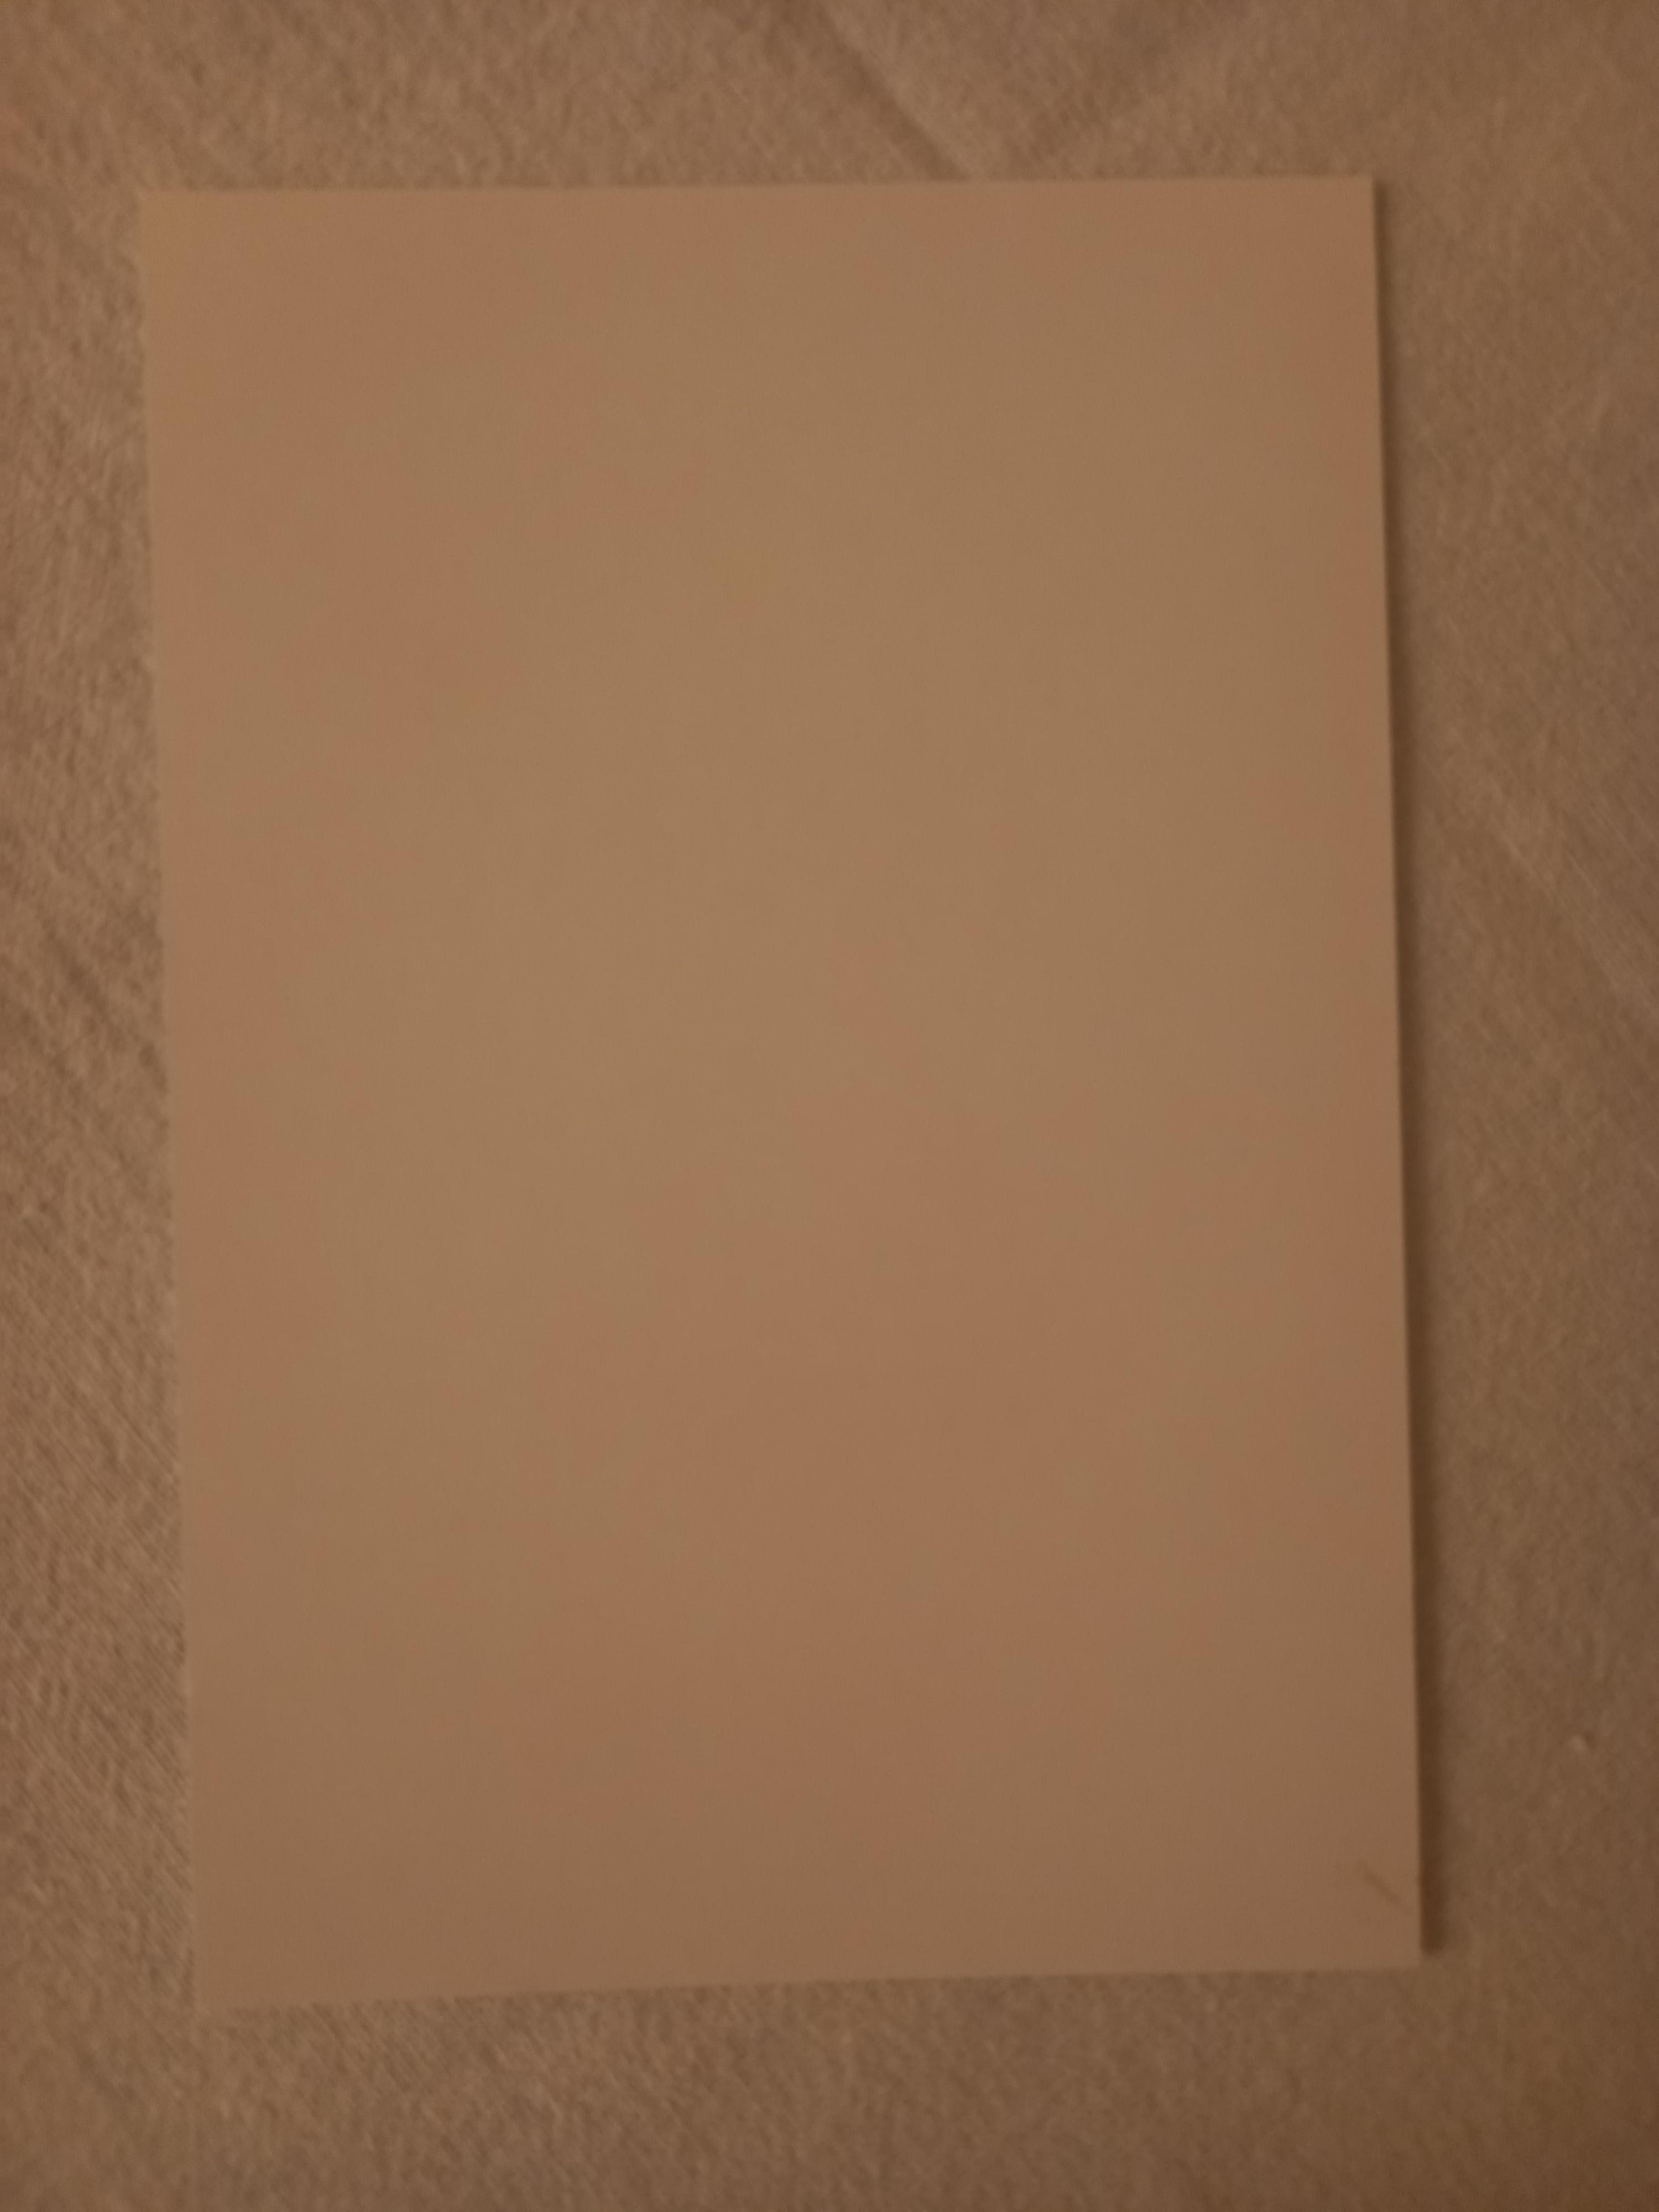 troc de troc carte. image 1